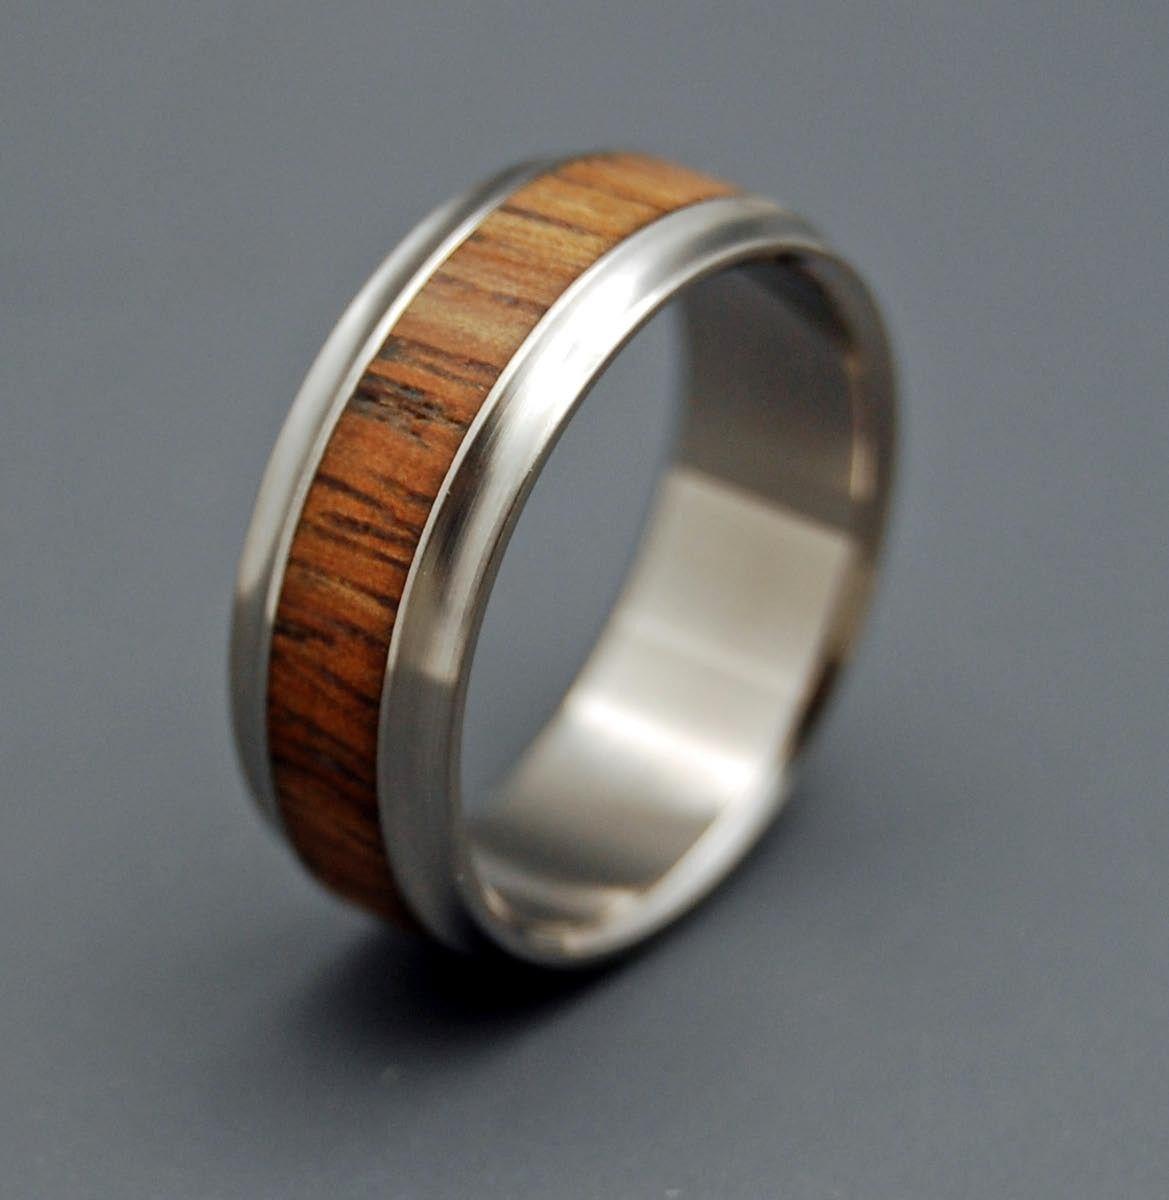 Mau loa    Minter + Richter | Titanium Rings - Koa Wood Rings | Titanium Rings | Minter + Richter